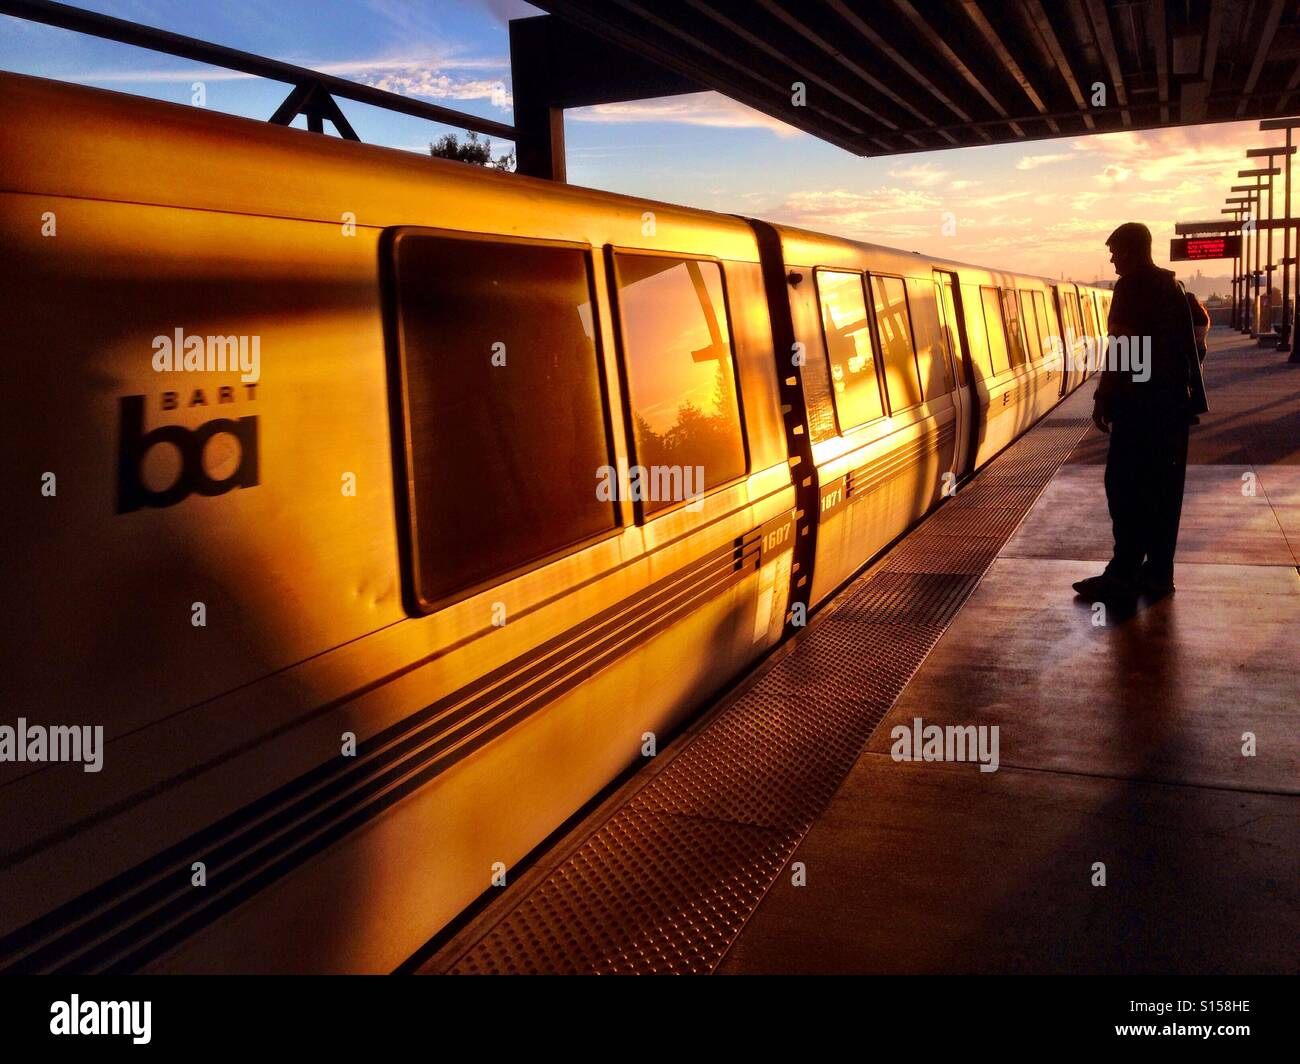 Bay Area Rapid Transit train - Stock Image